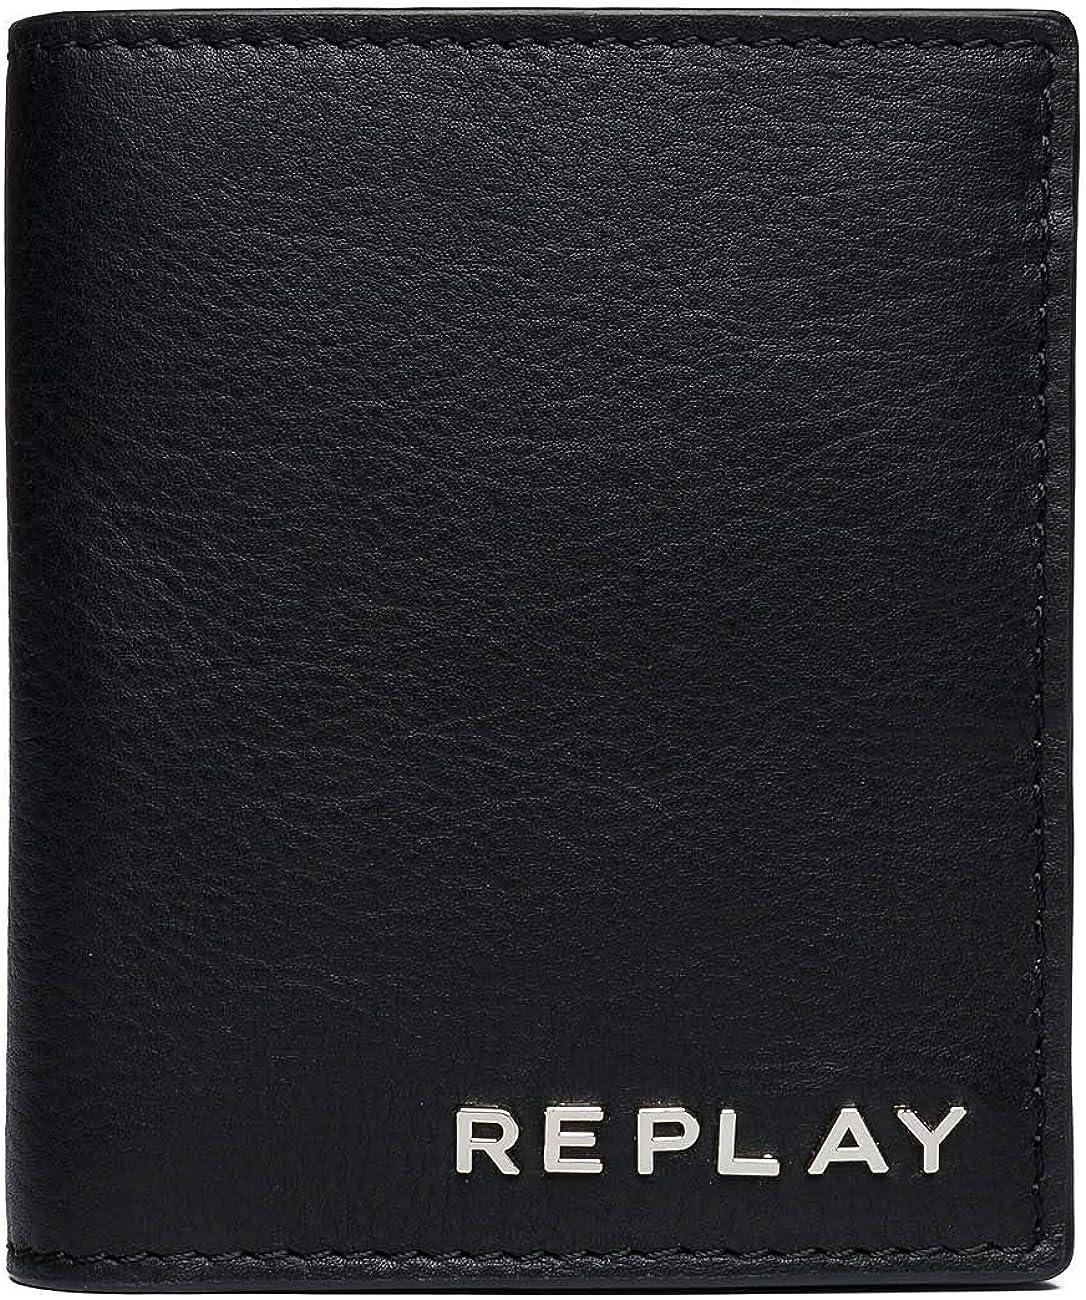 REPLAY ReplayFm5163.000.a3146HombreCarterasNegro (Black) 1x10,5x9 centimeters (B x H x T)